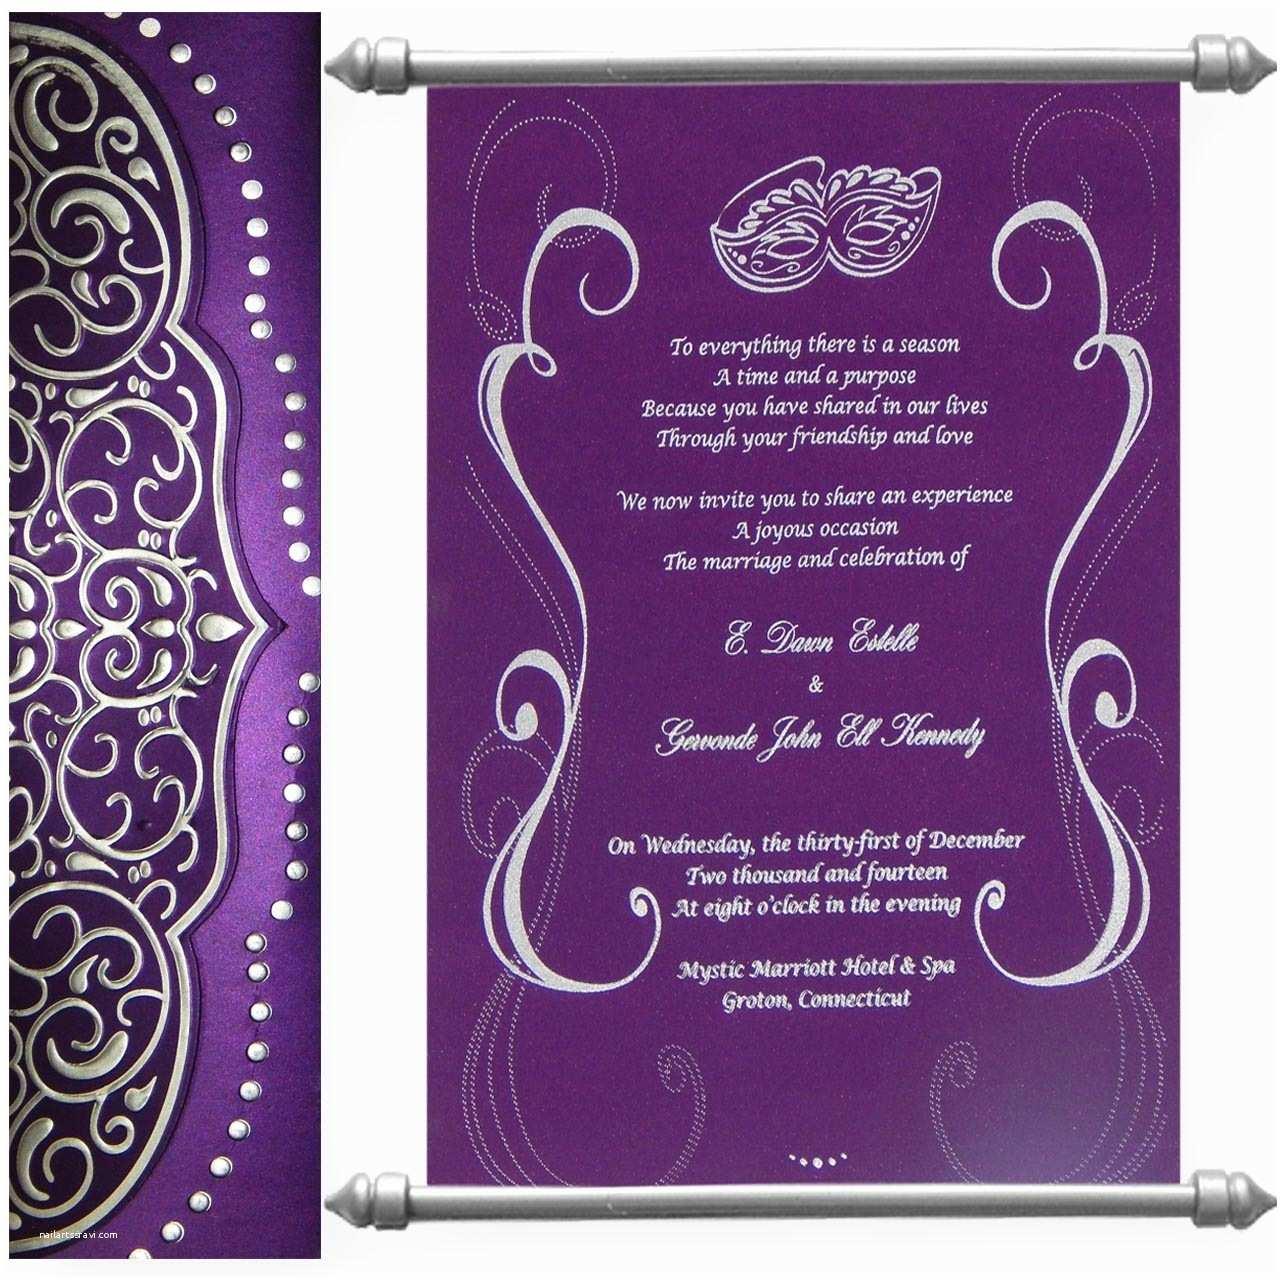 Indian Wedding Invitations Usa Indian Scroll Wedding Invitations Usa Yaseen